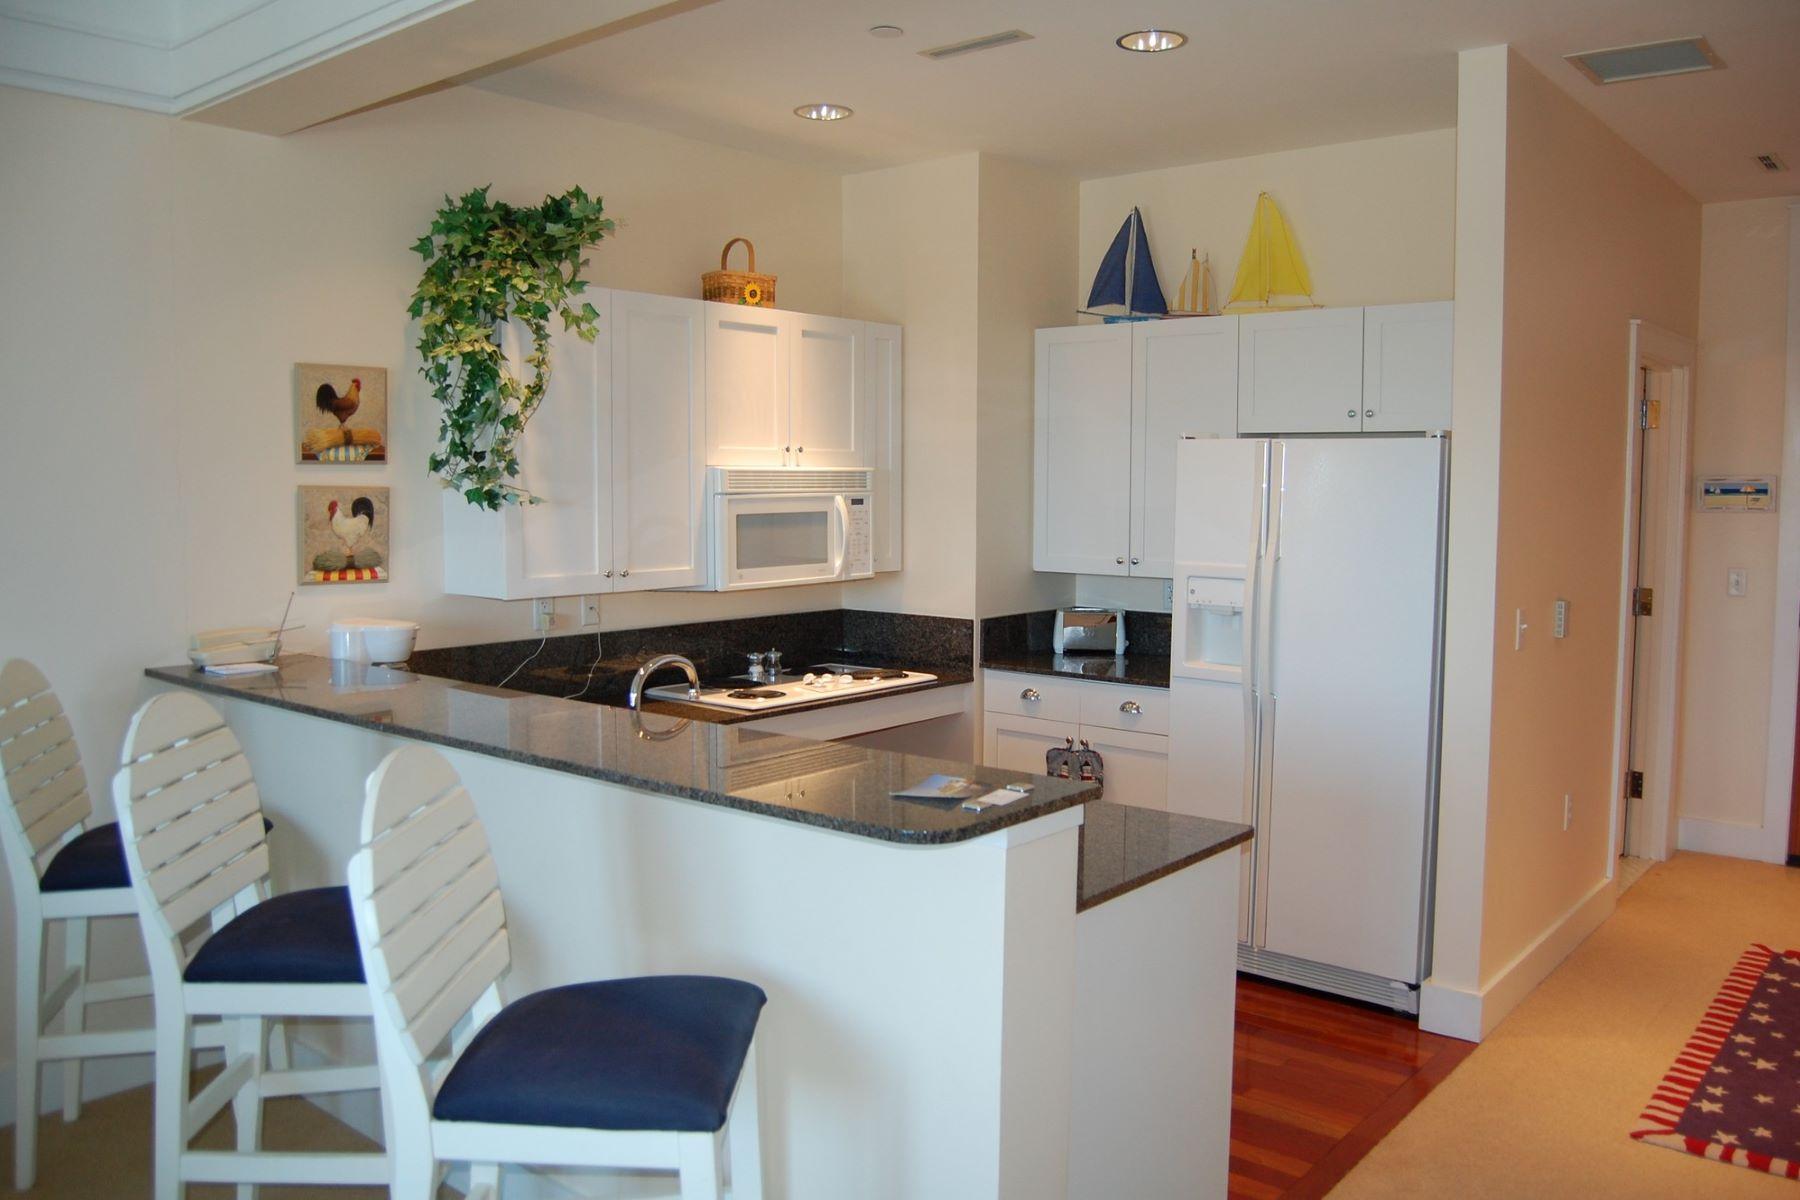 Condominium for Sale at Marina District 35 4200 Main Street Unit #35 Bay Harbor, Michigan, 49770 United States